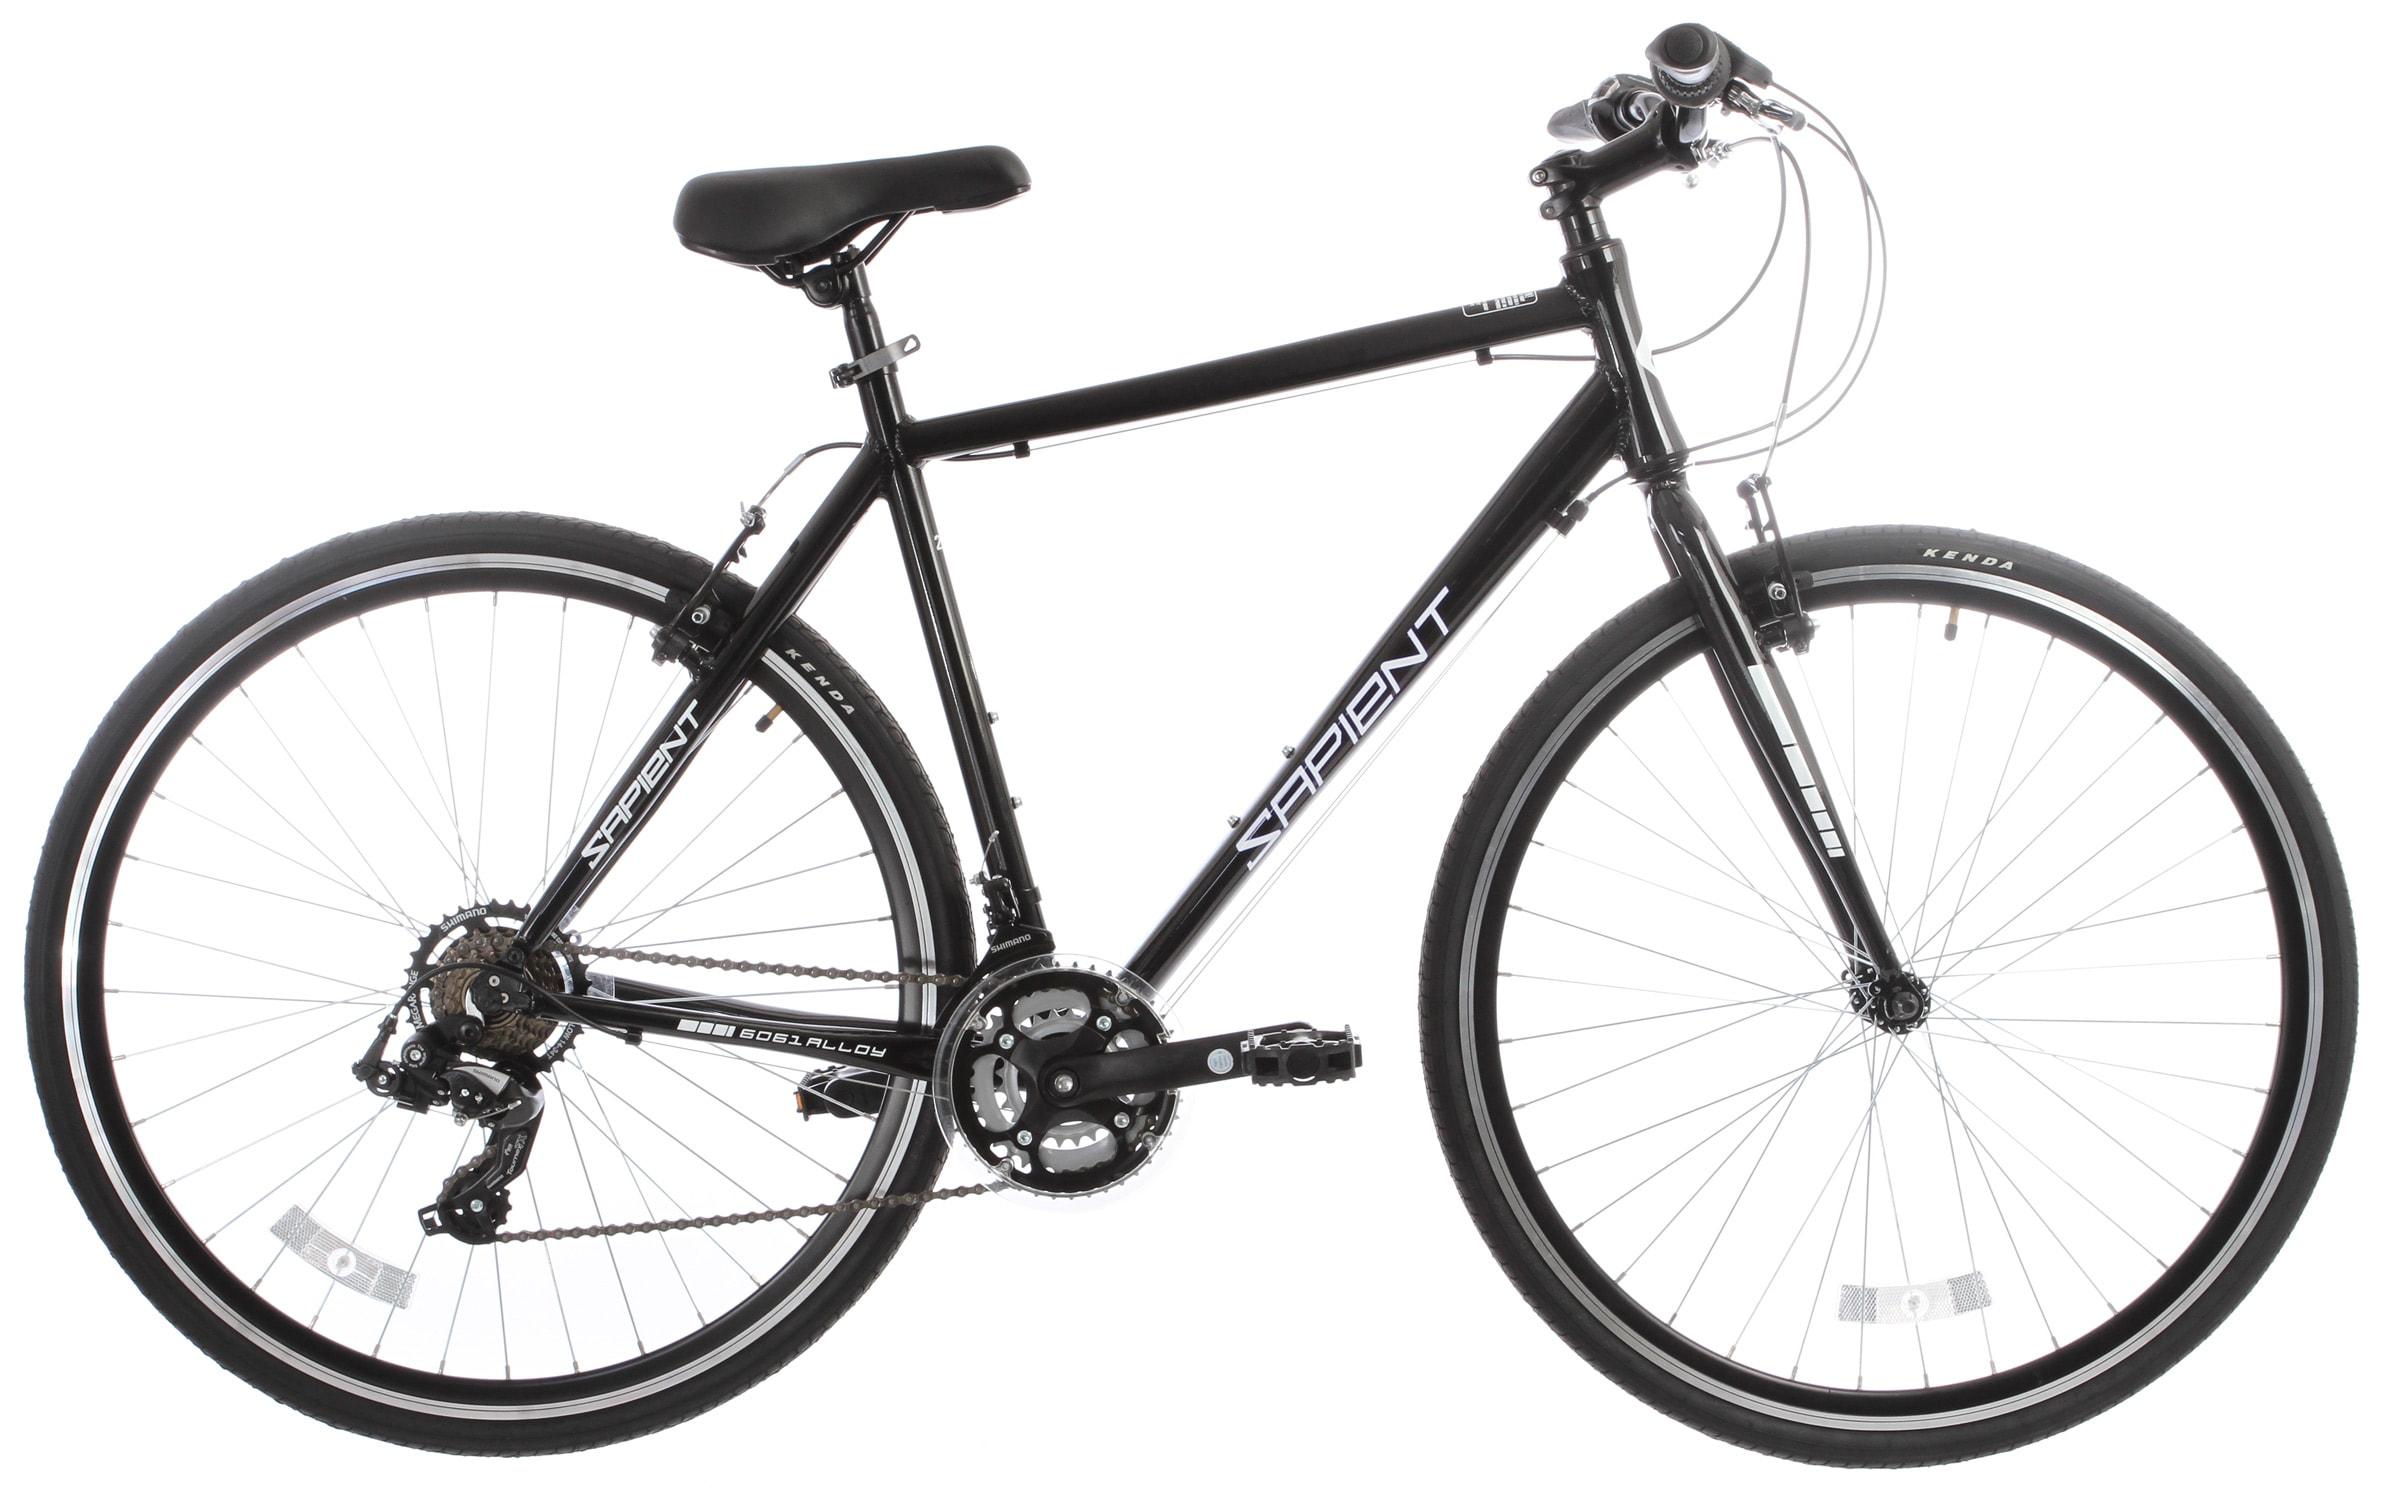 locks bicycle products comfort bicycles comforter black seatylock chameleon